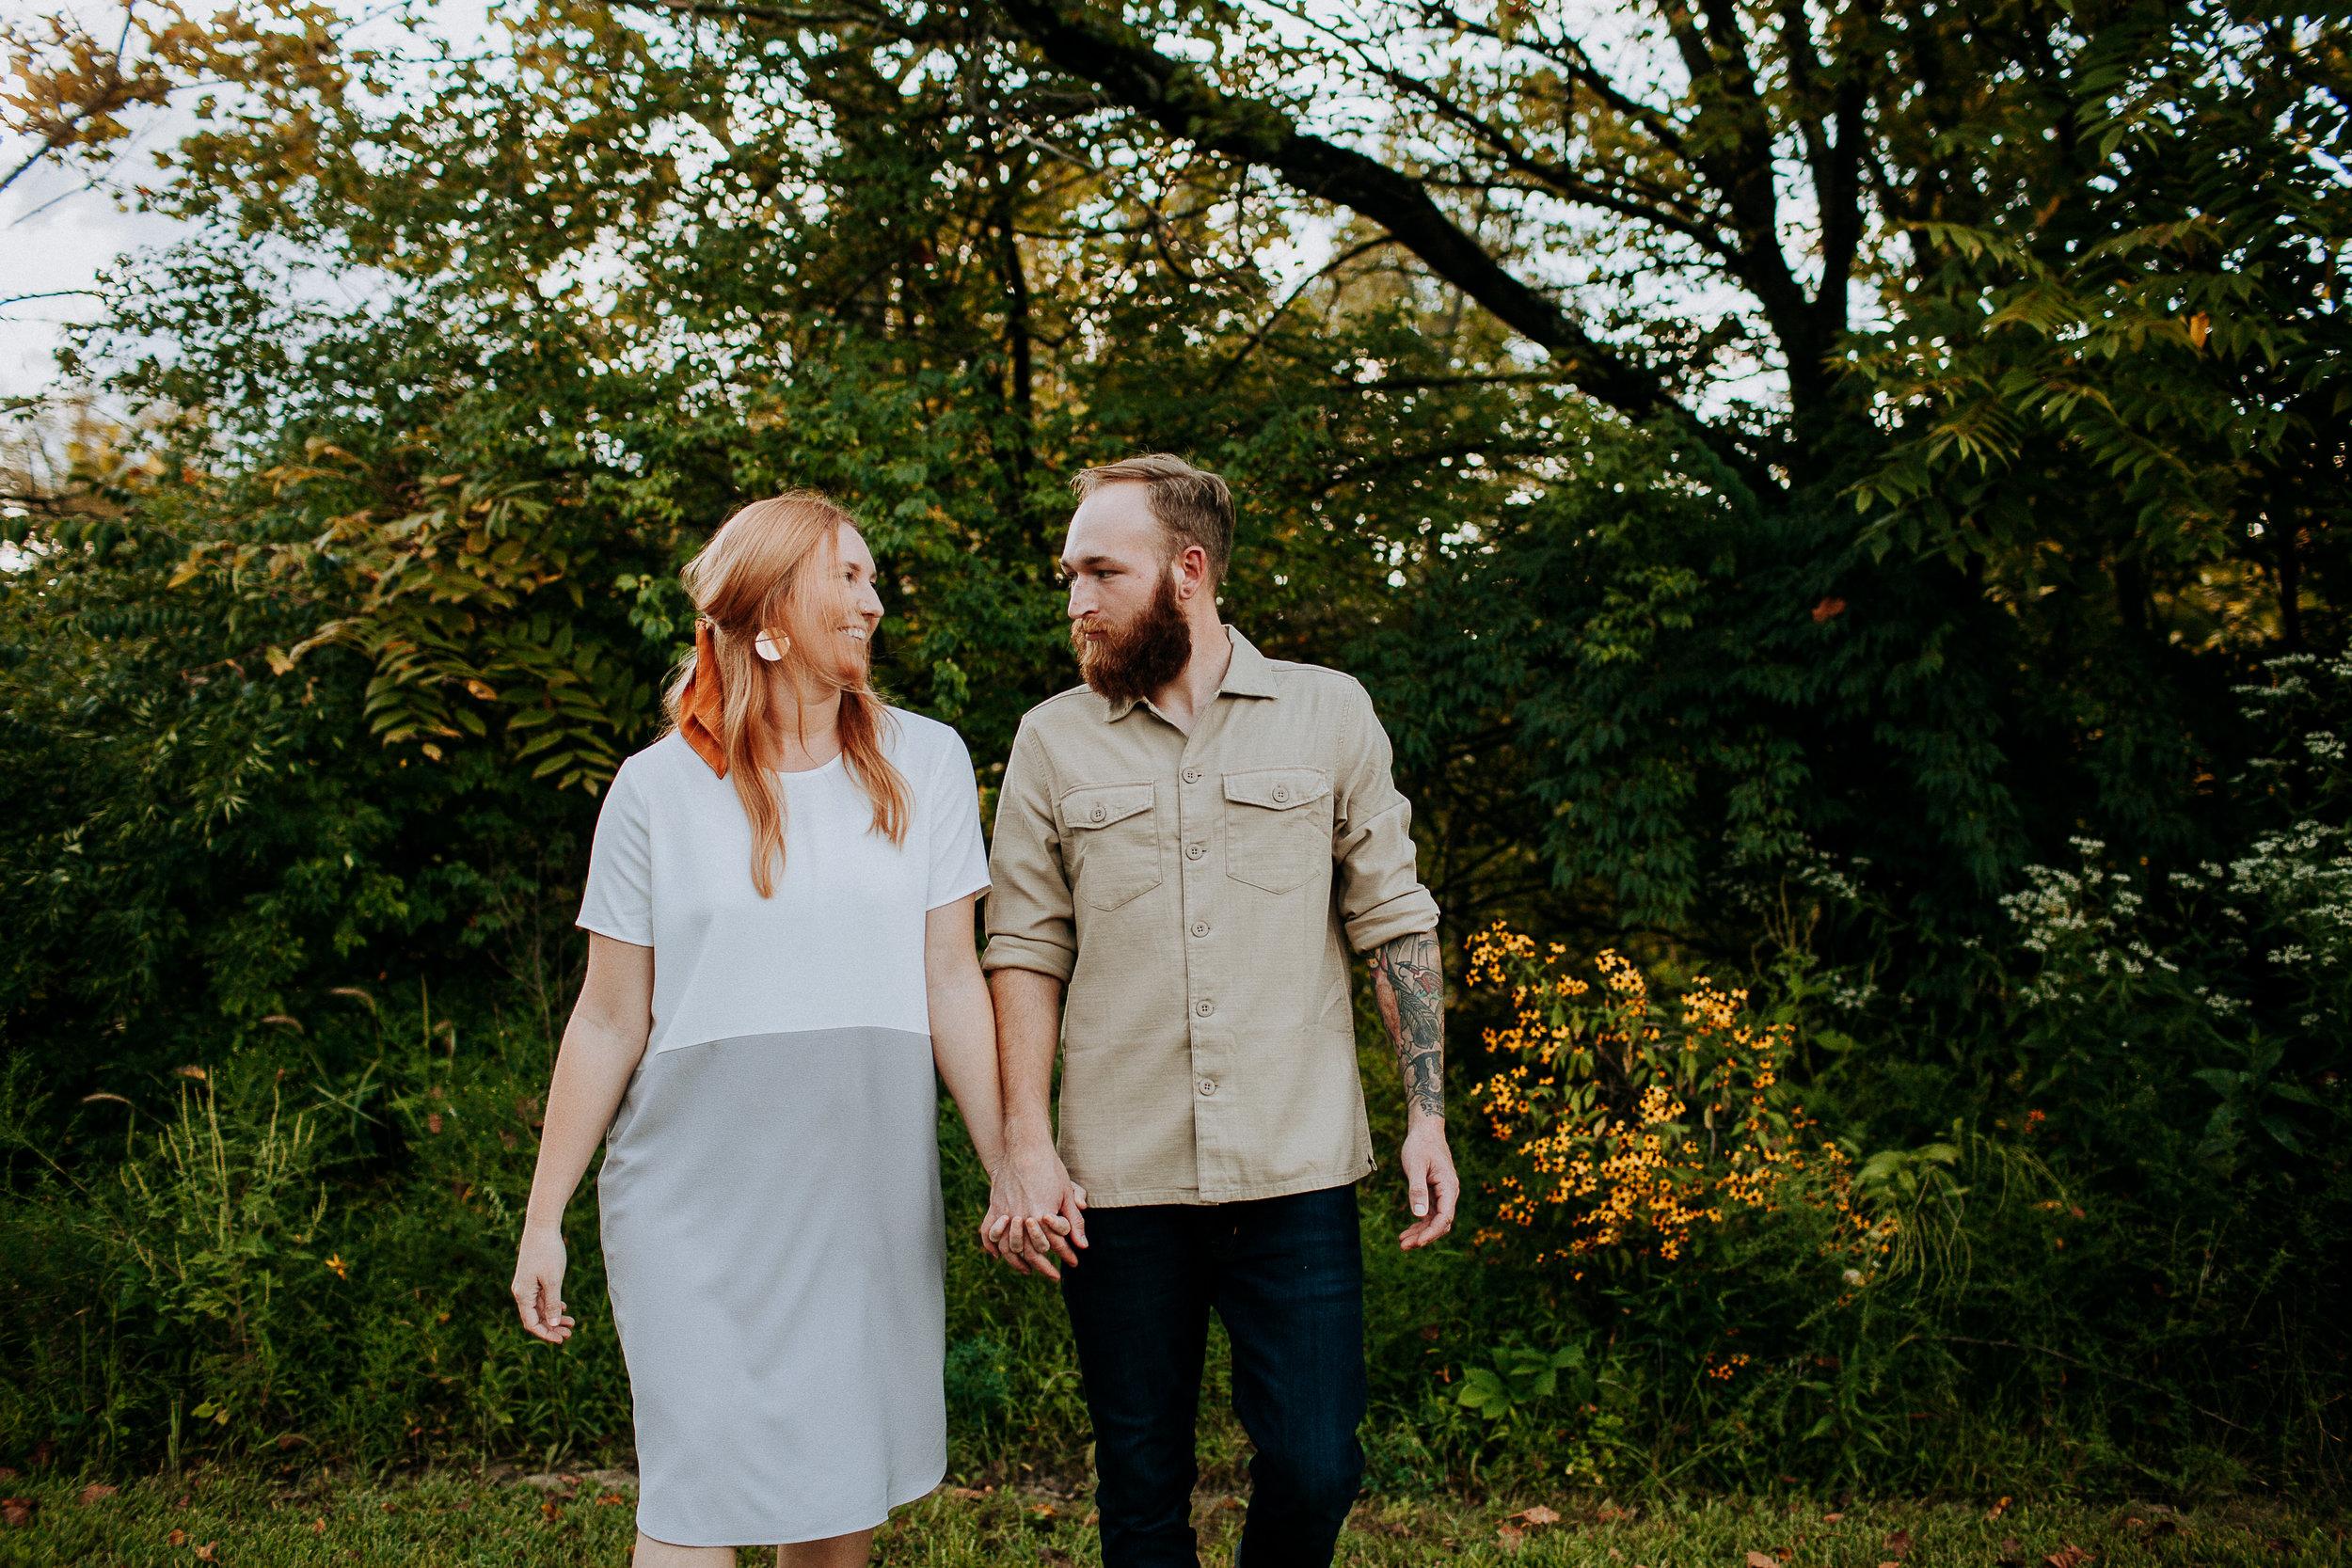 001 Morgan & Clay Engagement  - 20180902.jpg